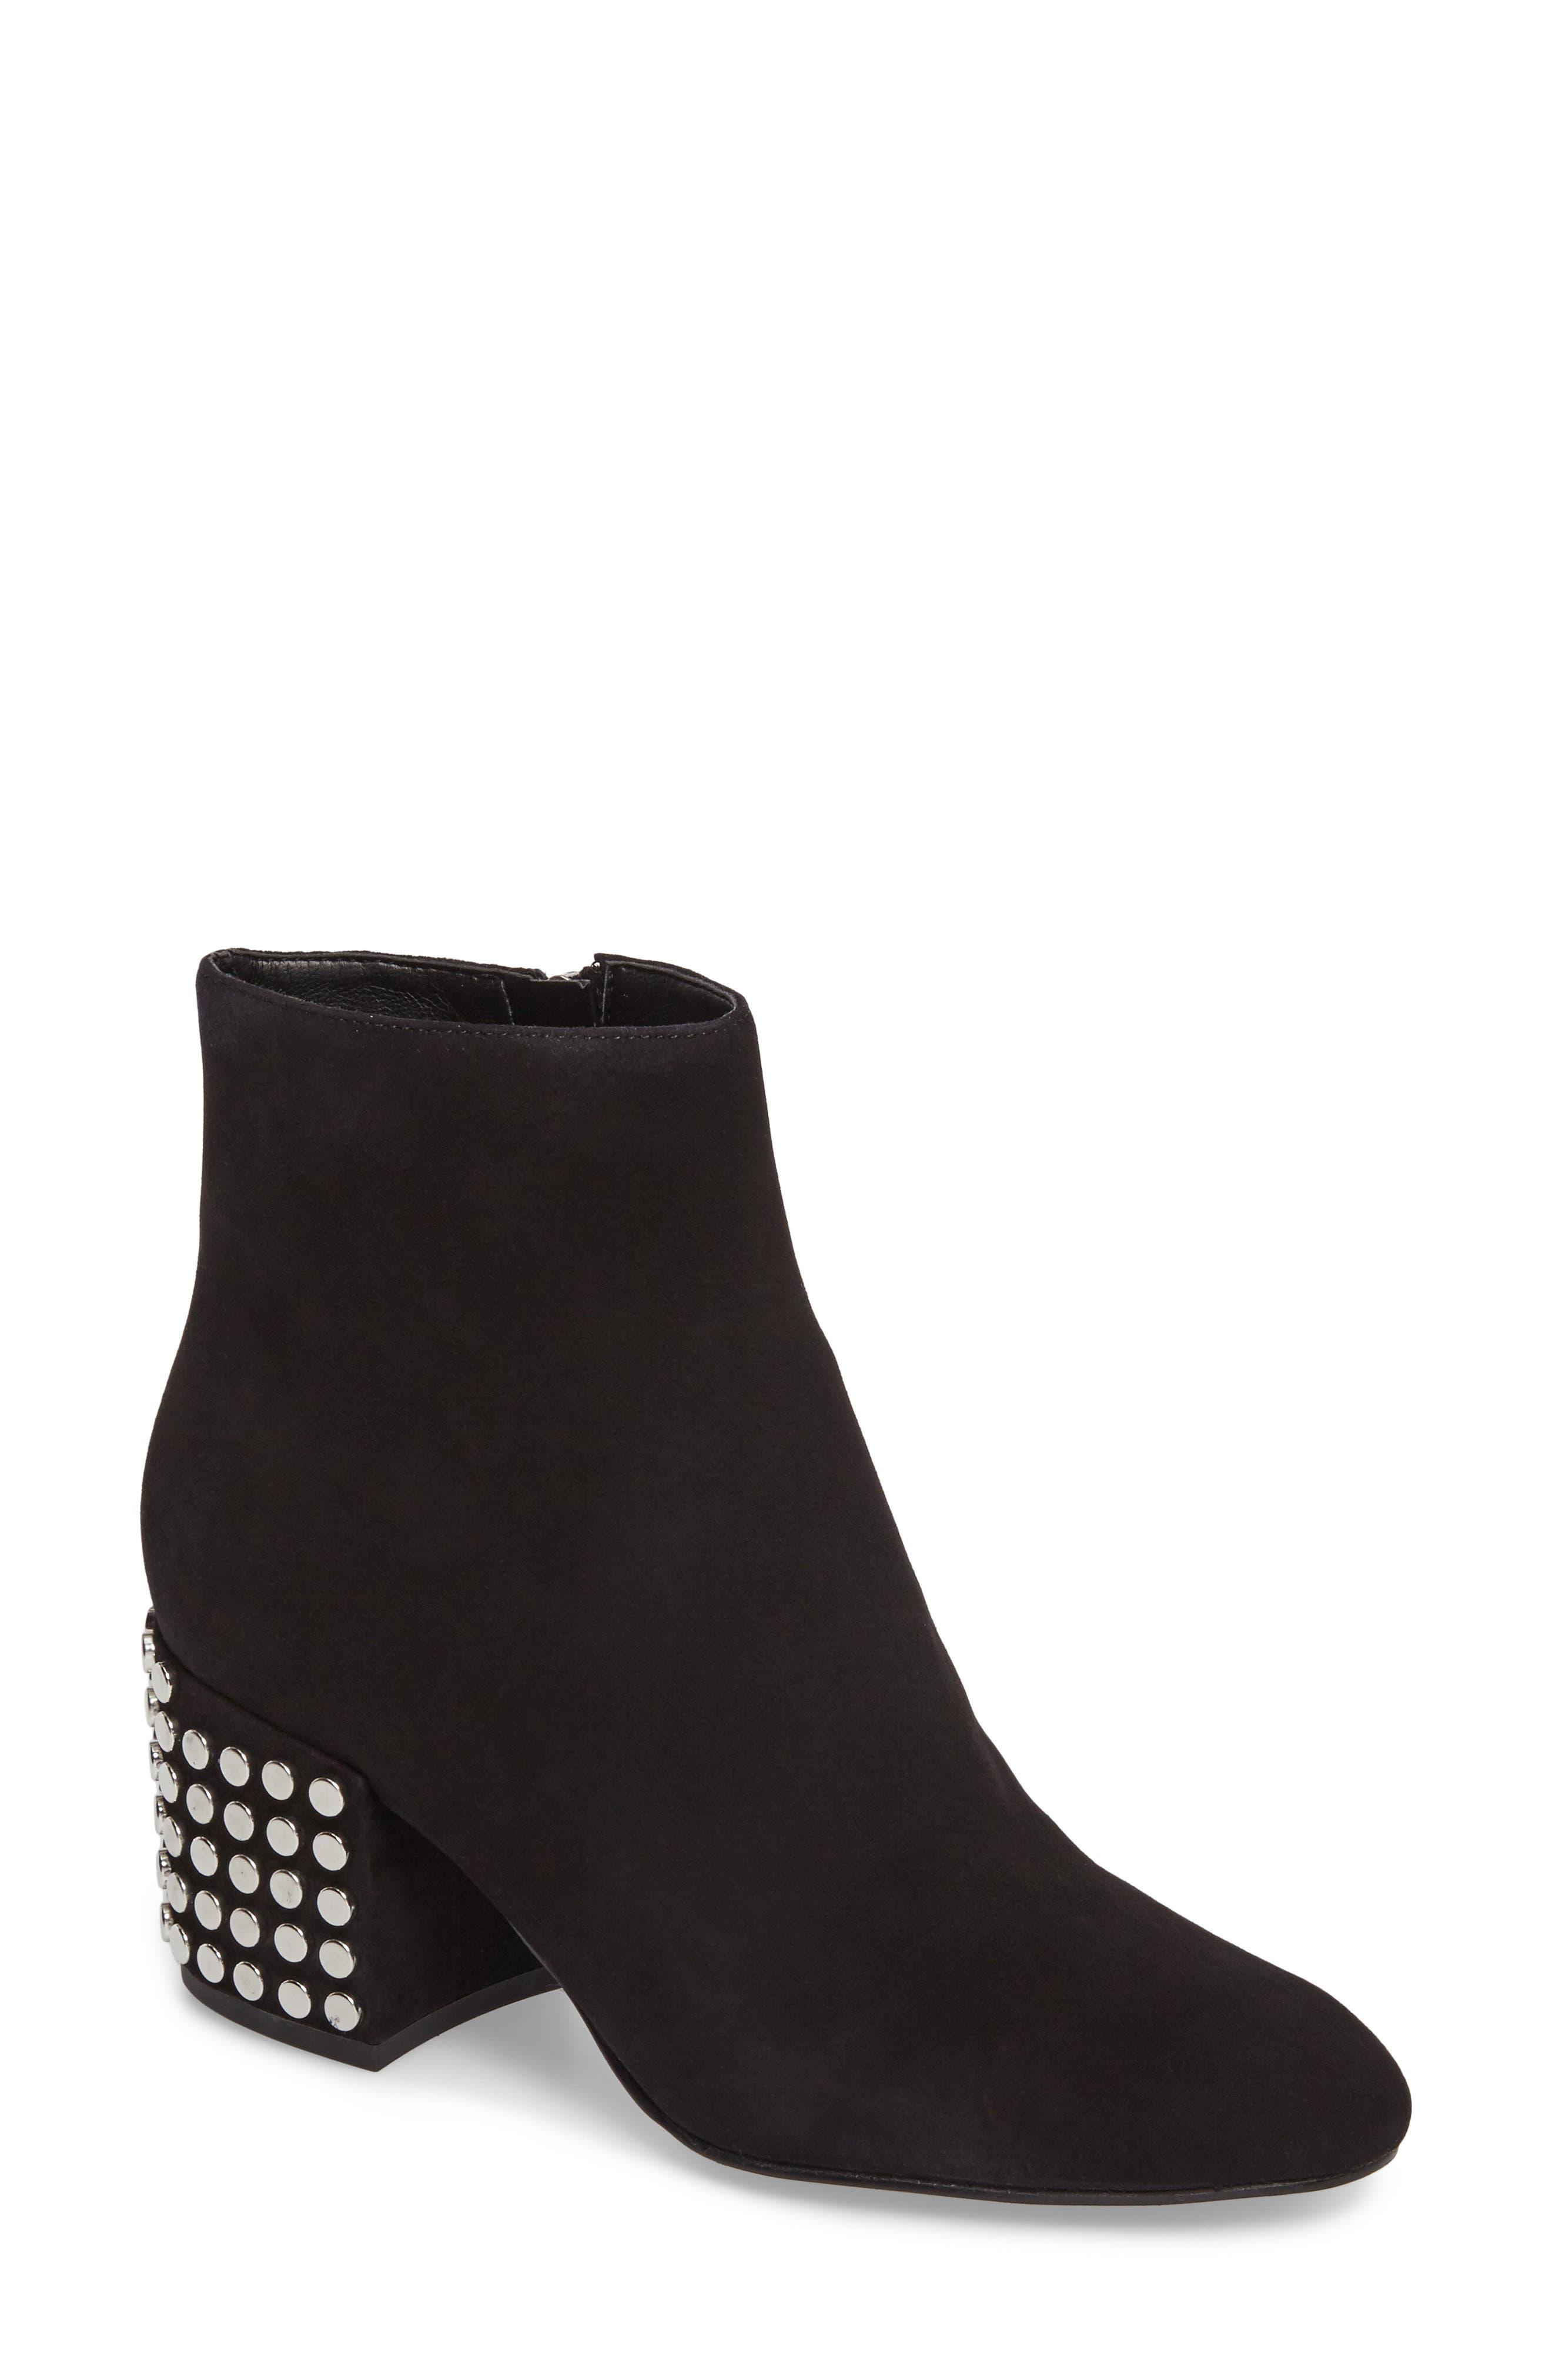 Blythe Studded Heel Bootie,                         Main,                         color, Black Suede